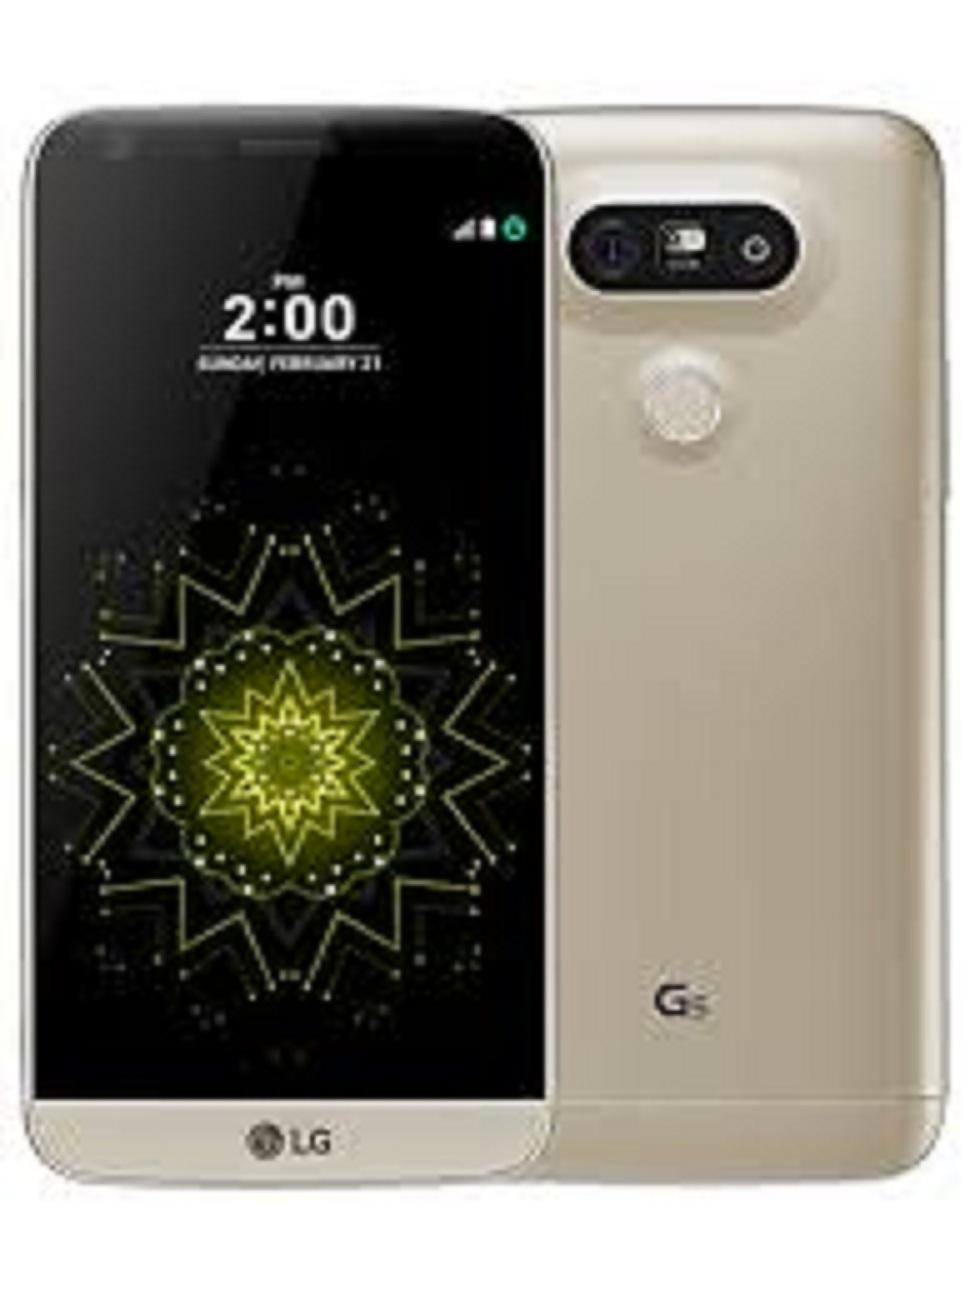 [SIÊU PHÁ GIÁ] LG G7 64G ram 4G - Fullbox - Chiến Game mượt